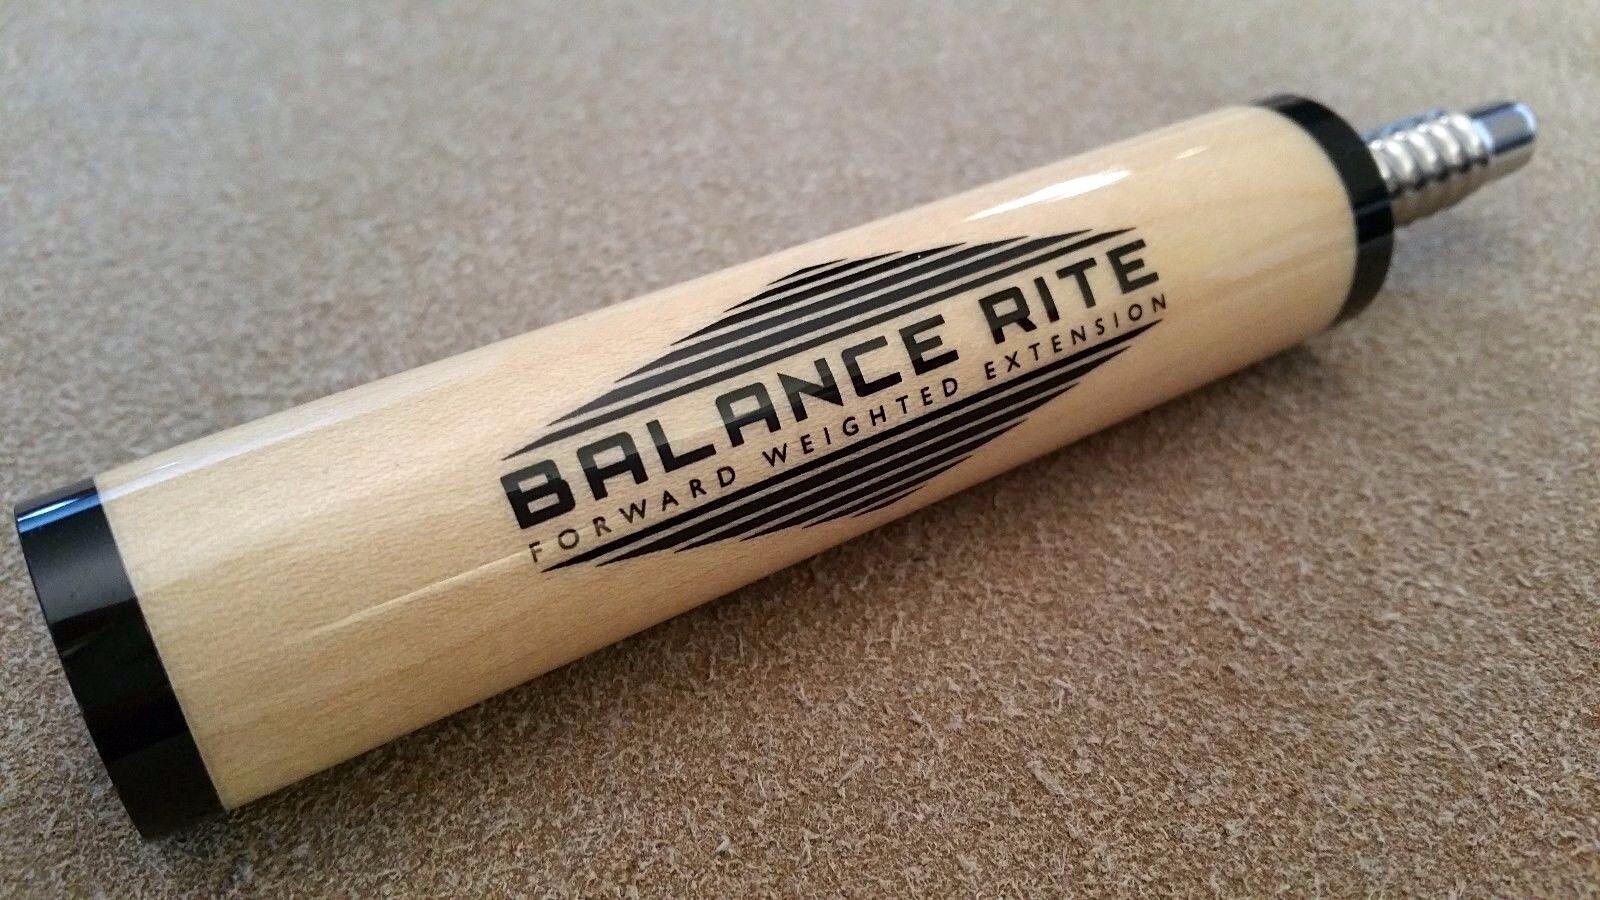 Balance Rite Pool Cue Extension   Uniloc - Radial - 5 16x18 - 5 16x14 - 3 8x10